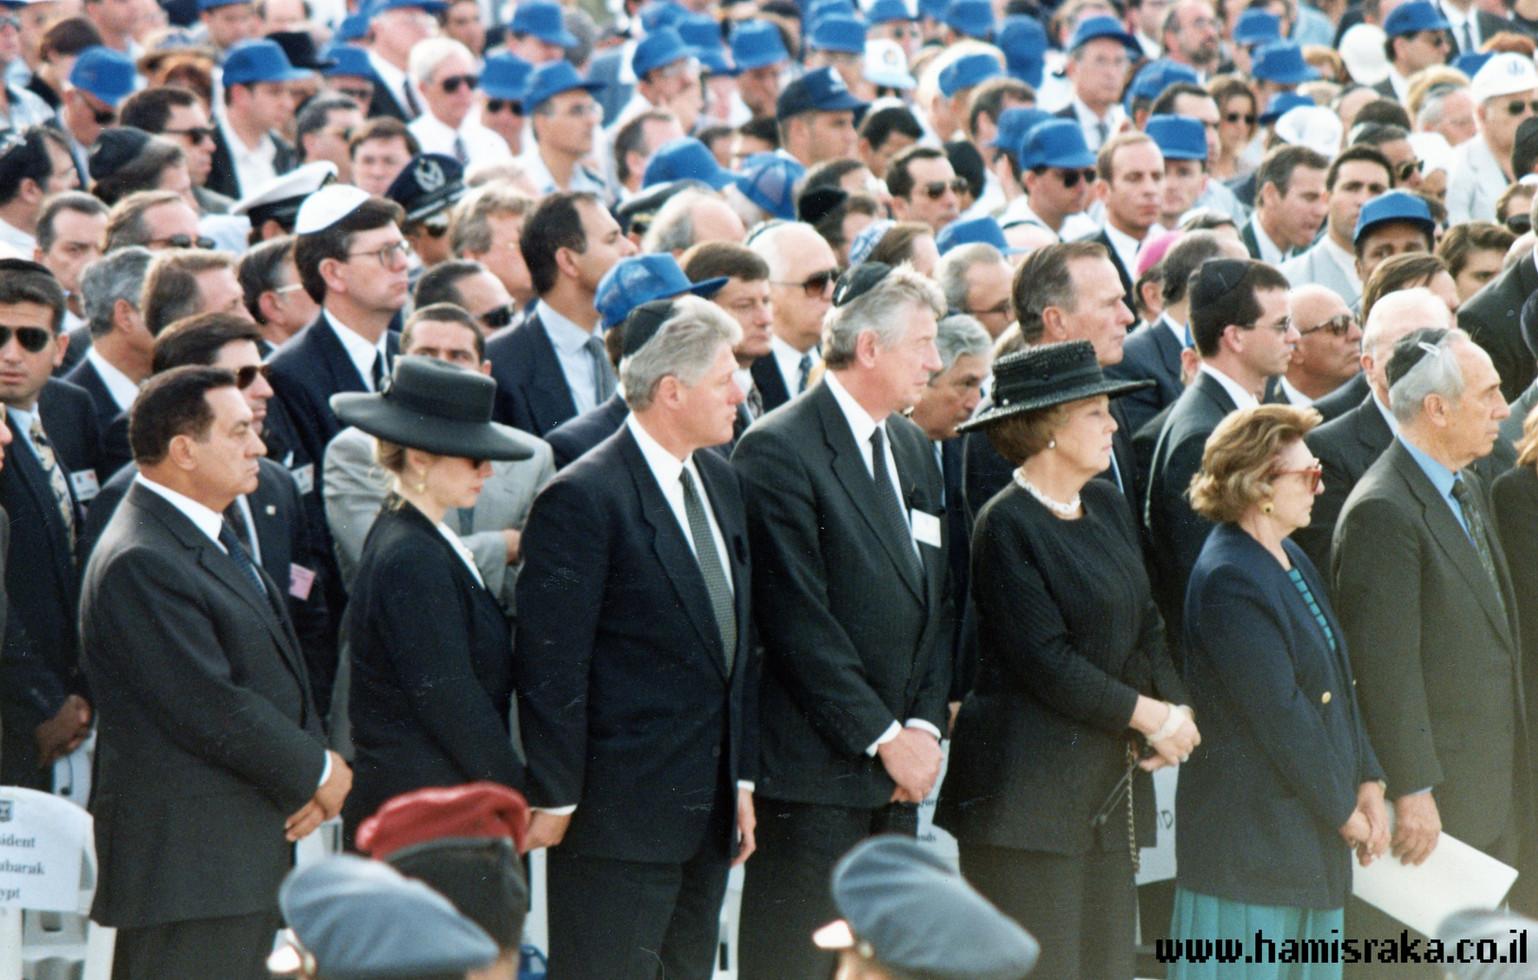 Pnina-Bor-Rabin-Funeral-5.jpg